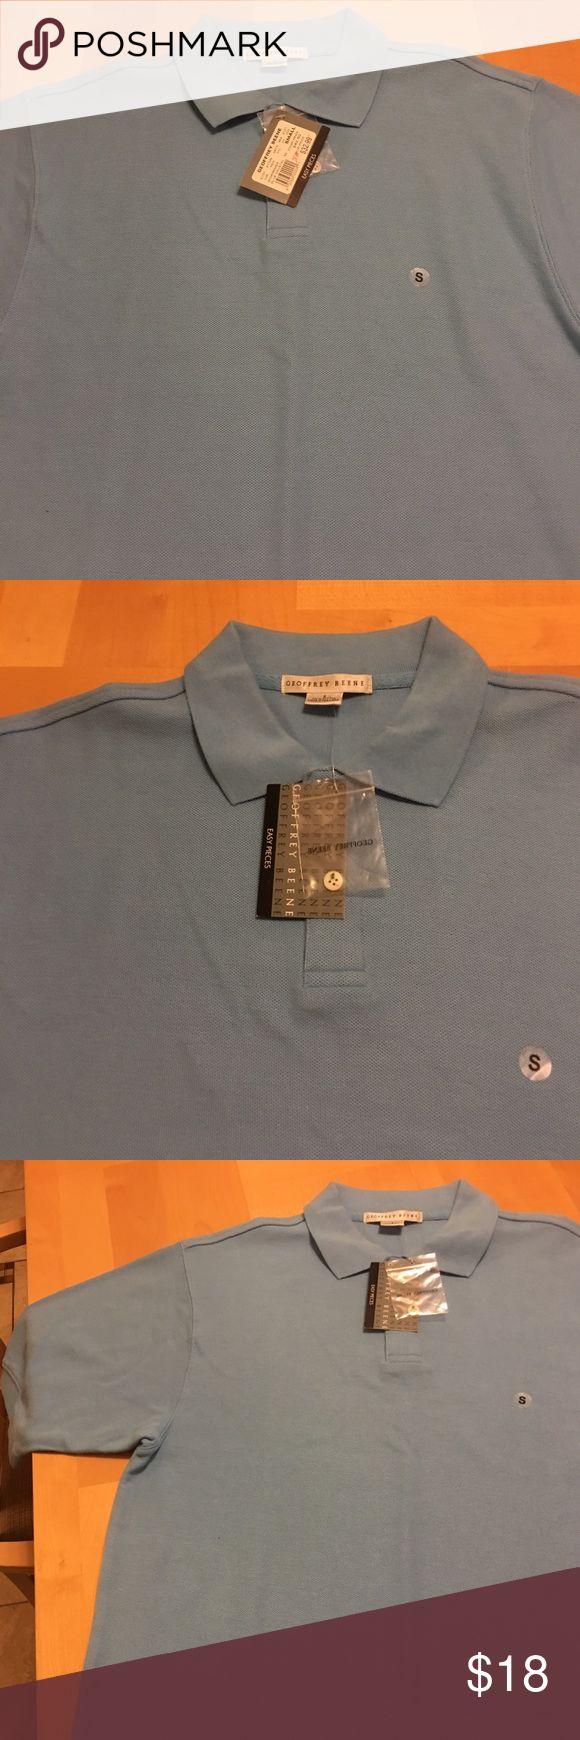 Men's light blue Polo style golf shirt NWT. GEOFFREY BEENE. Beautiful baby blue Polo style golf shirt. Geoffrey Beene Shirts Polos